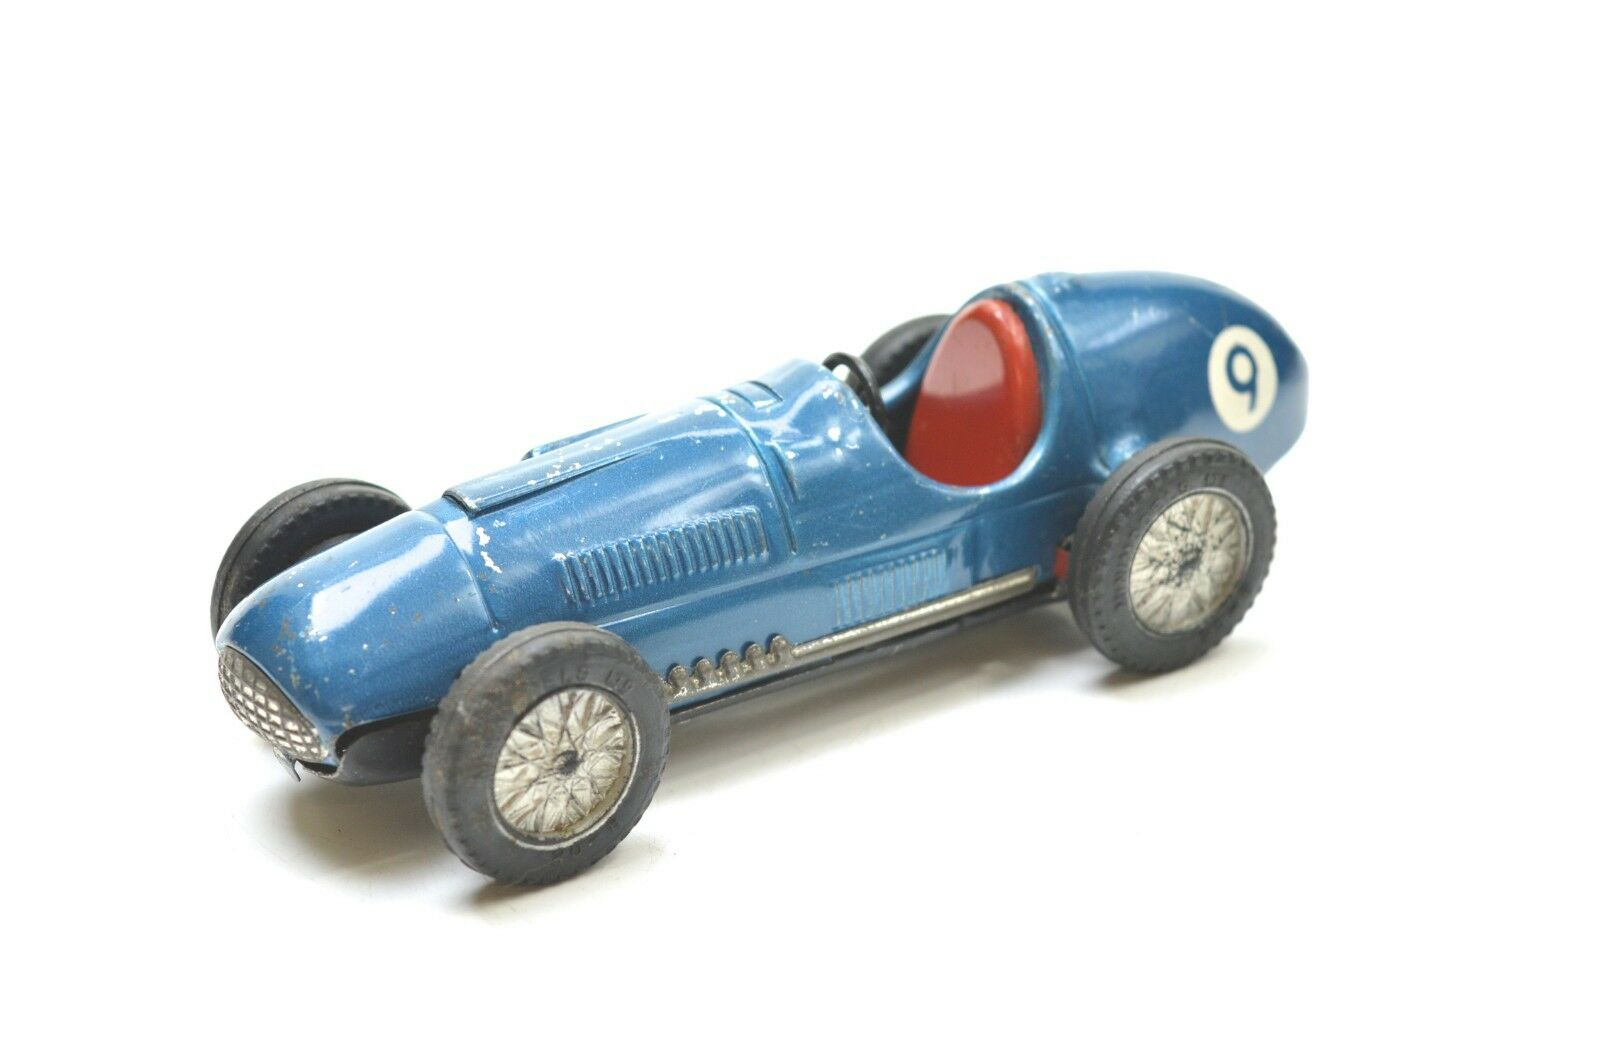 Scalex Ferrari 4.5 racing racing racing car befb86